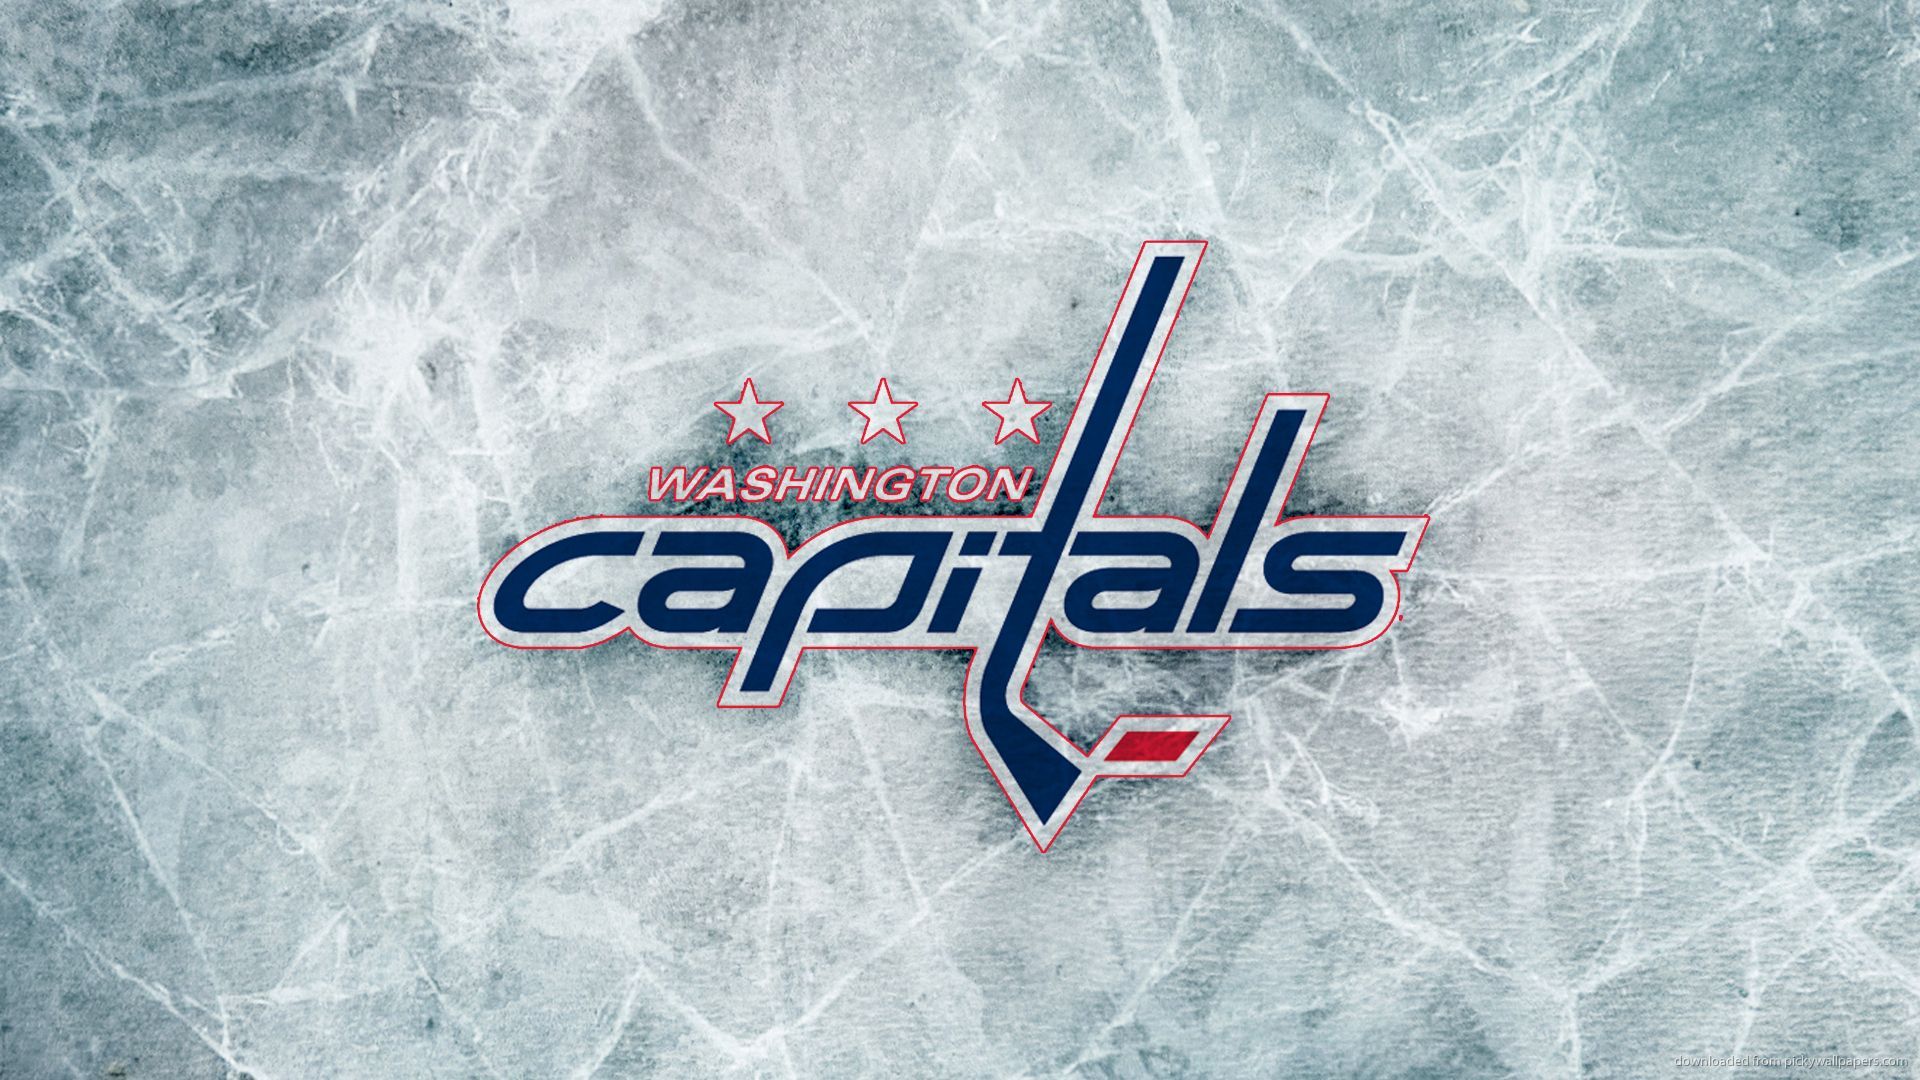 washington capitals   Washington Capitals logo for 1920x1080